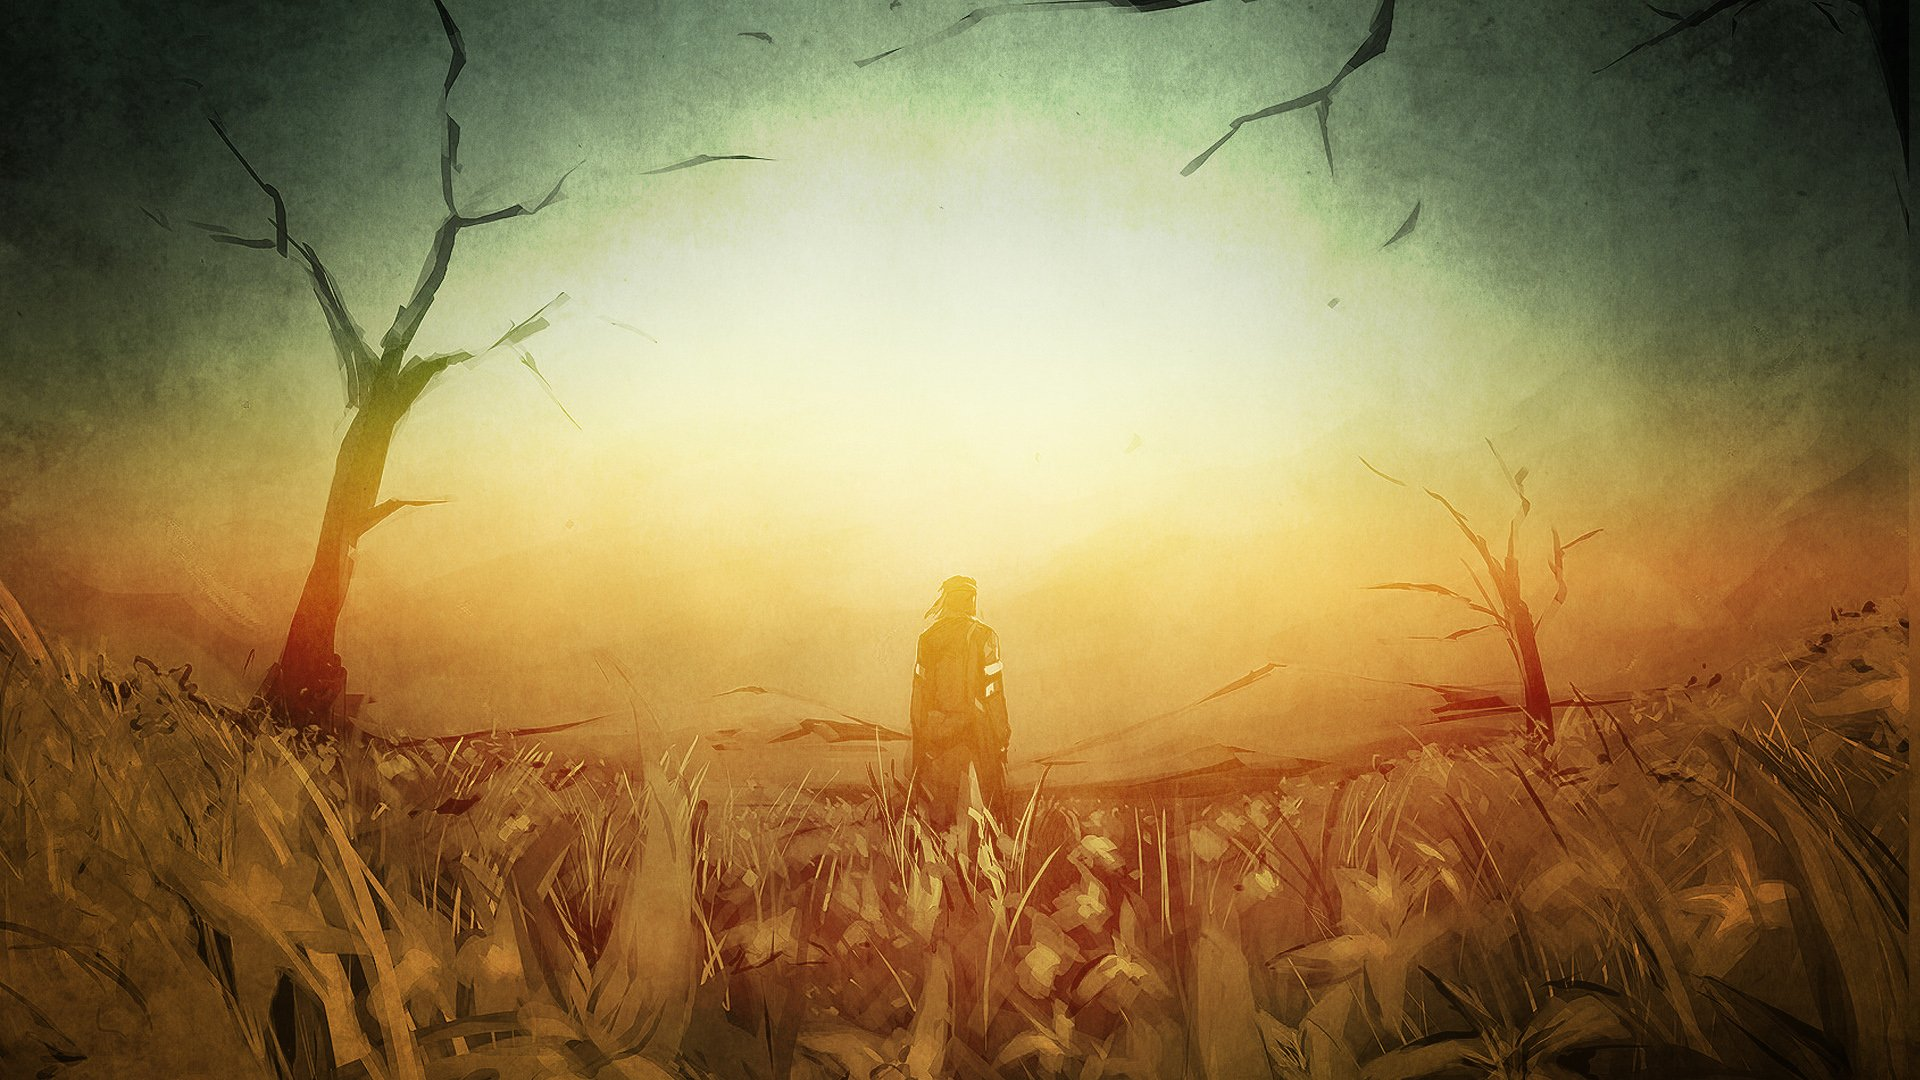 Metal Gear Solid 3 Snake Eater Hd Wallpaper Background Image